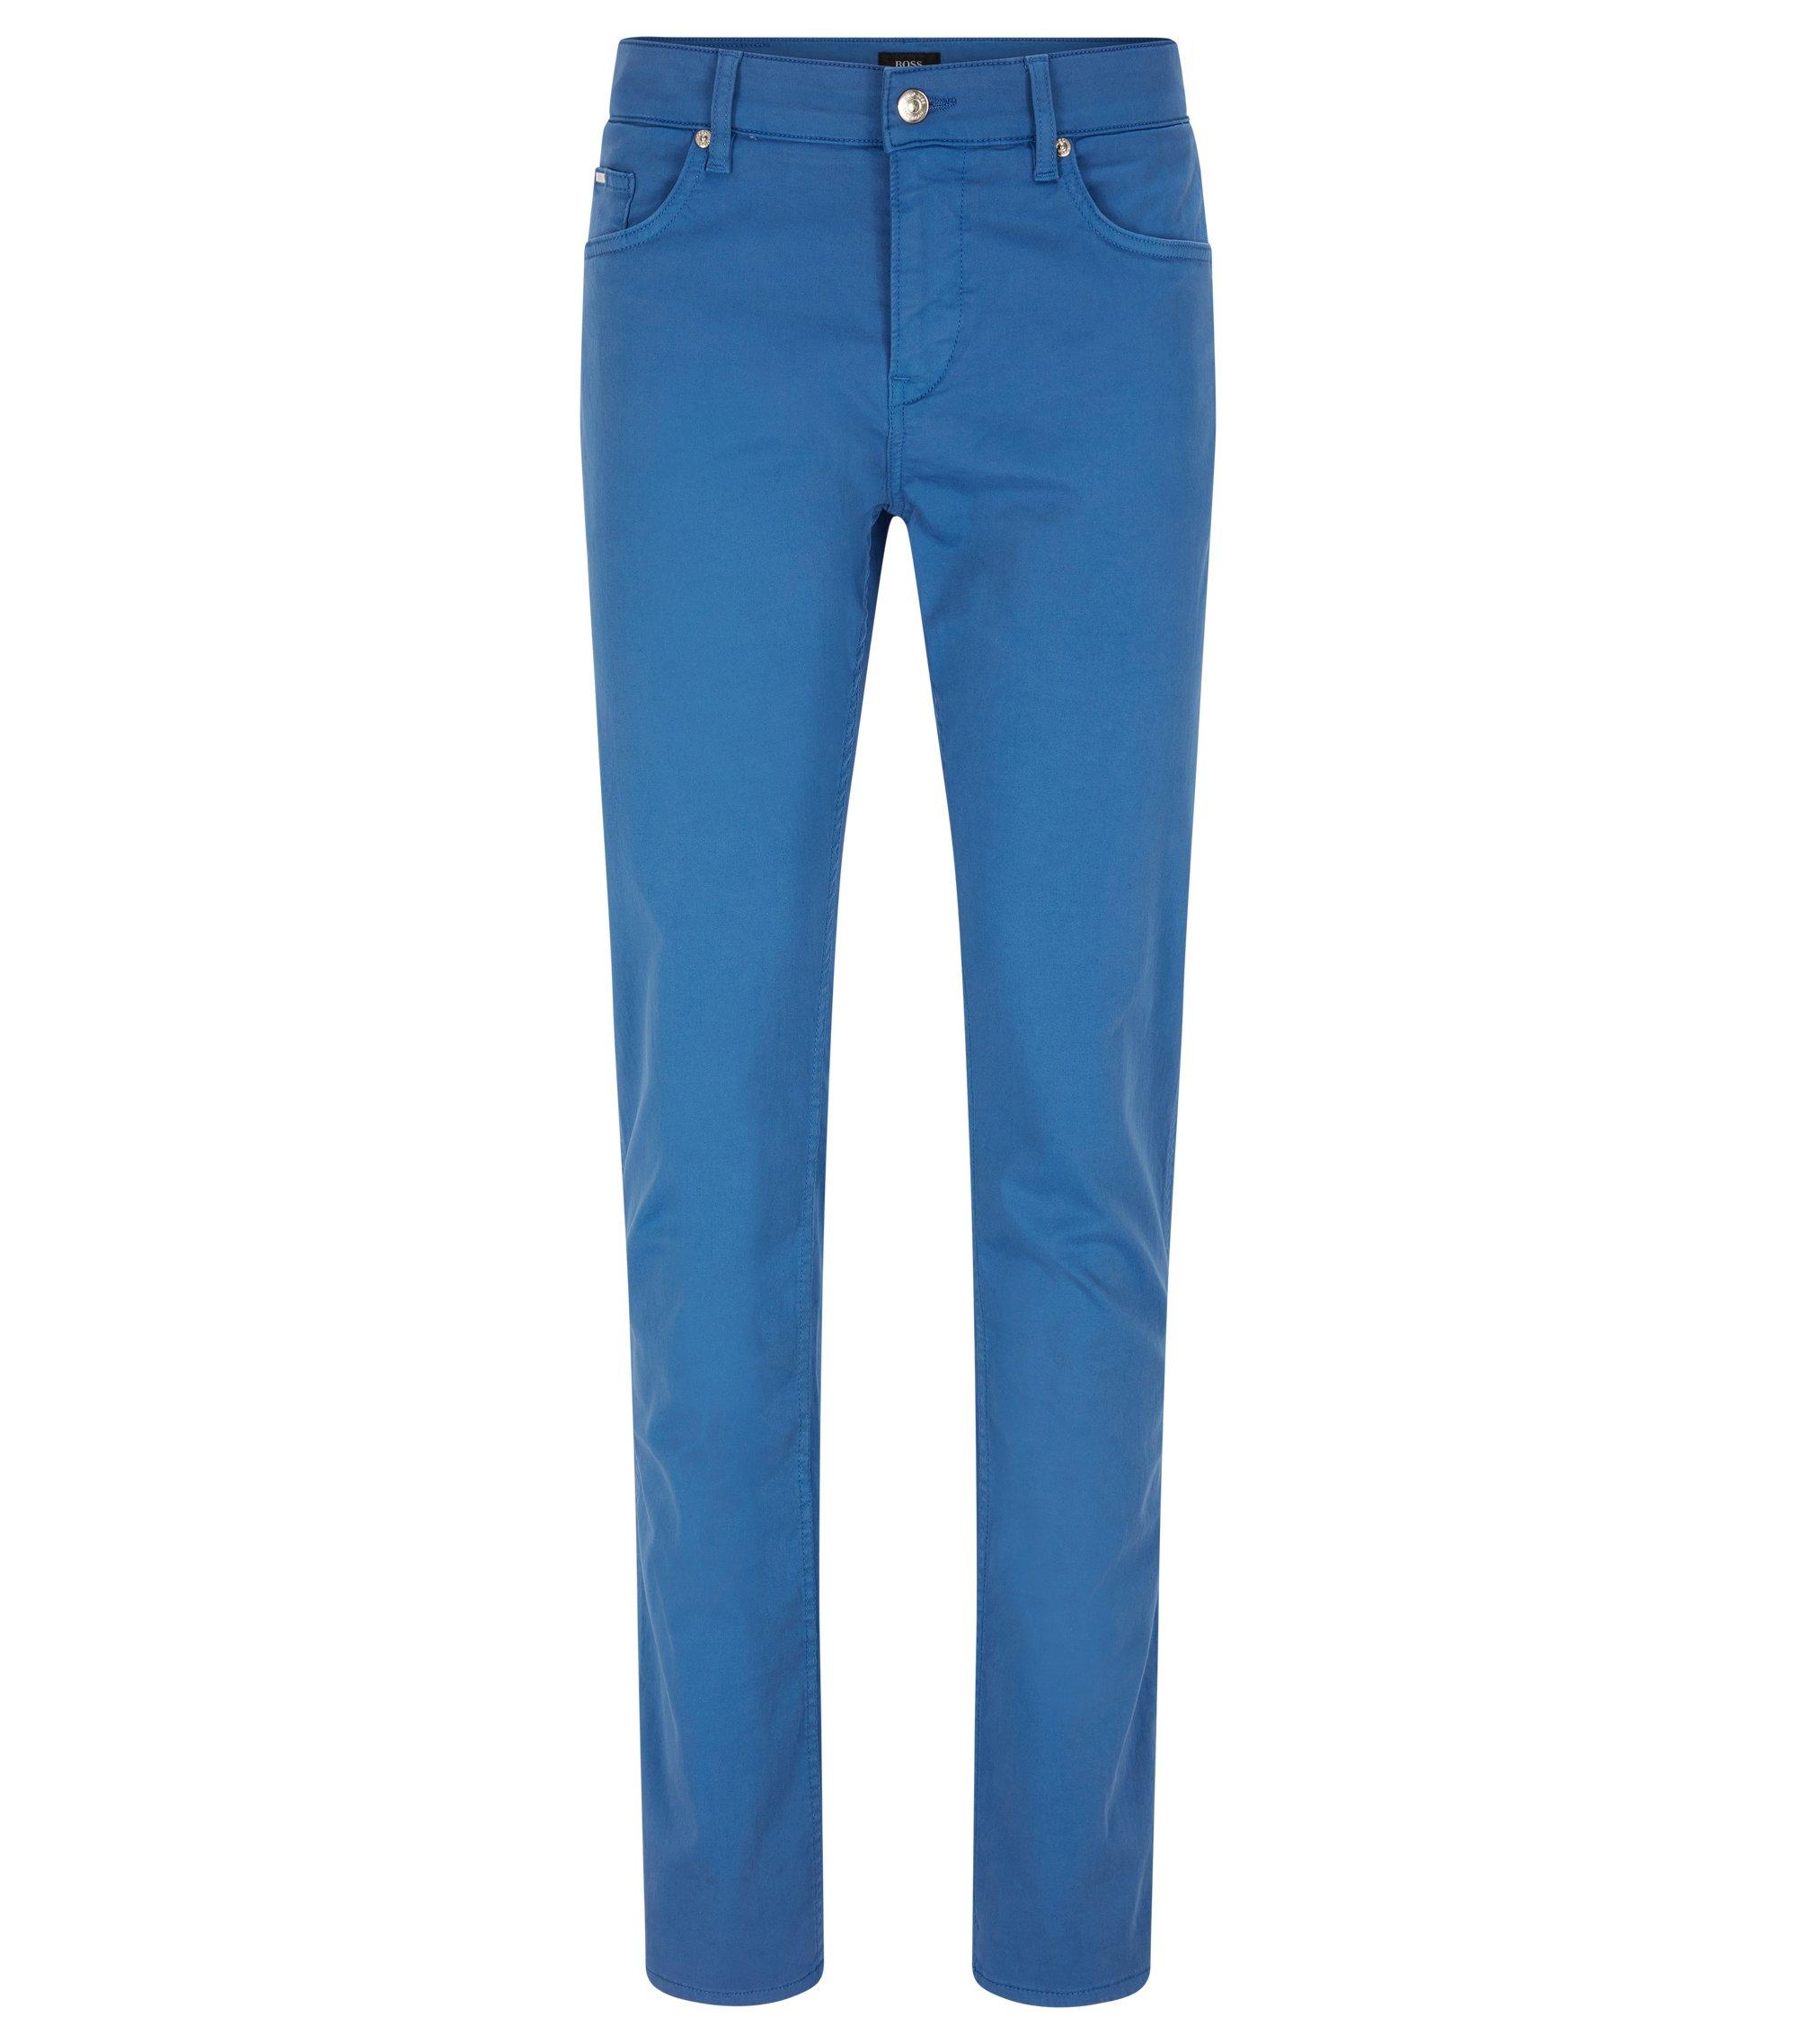 Jeans Slim Fit en denim stretch effet satin, Bleu